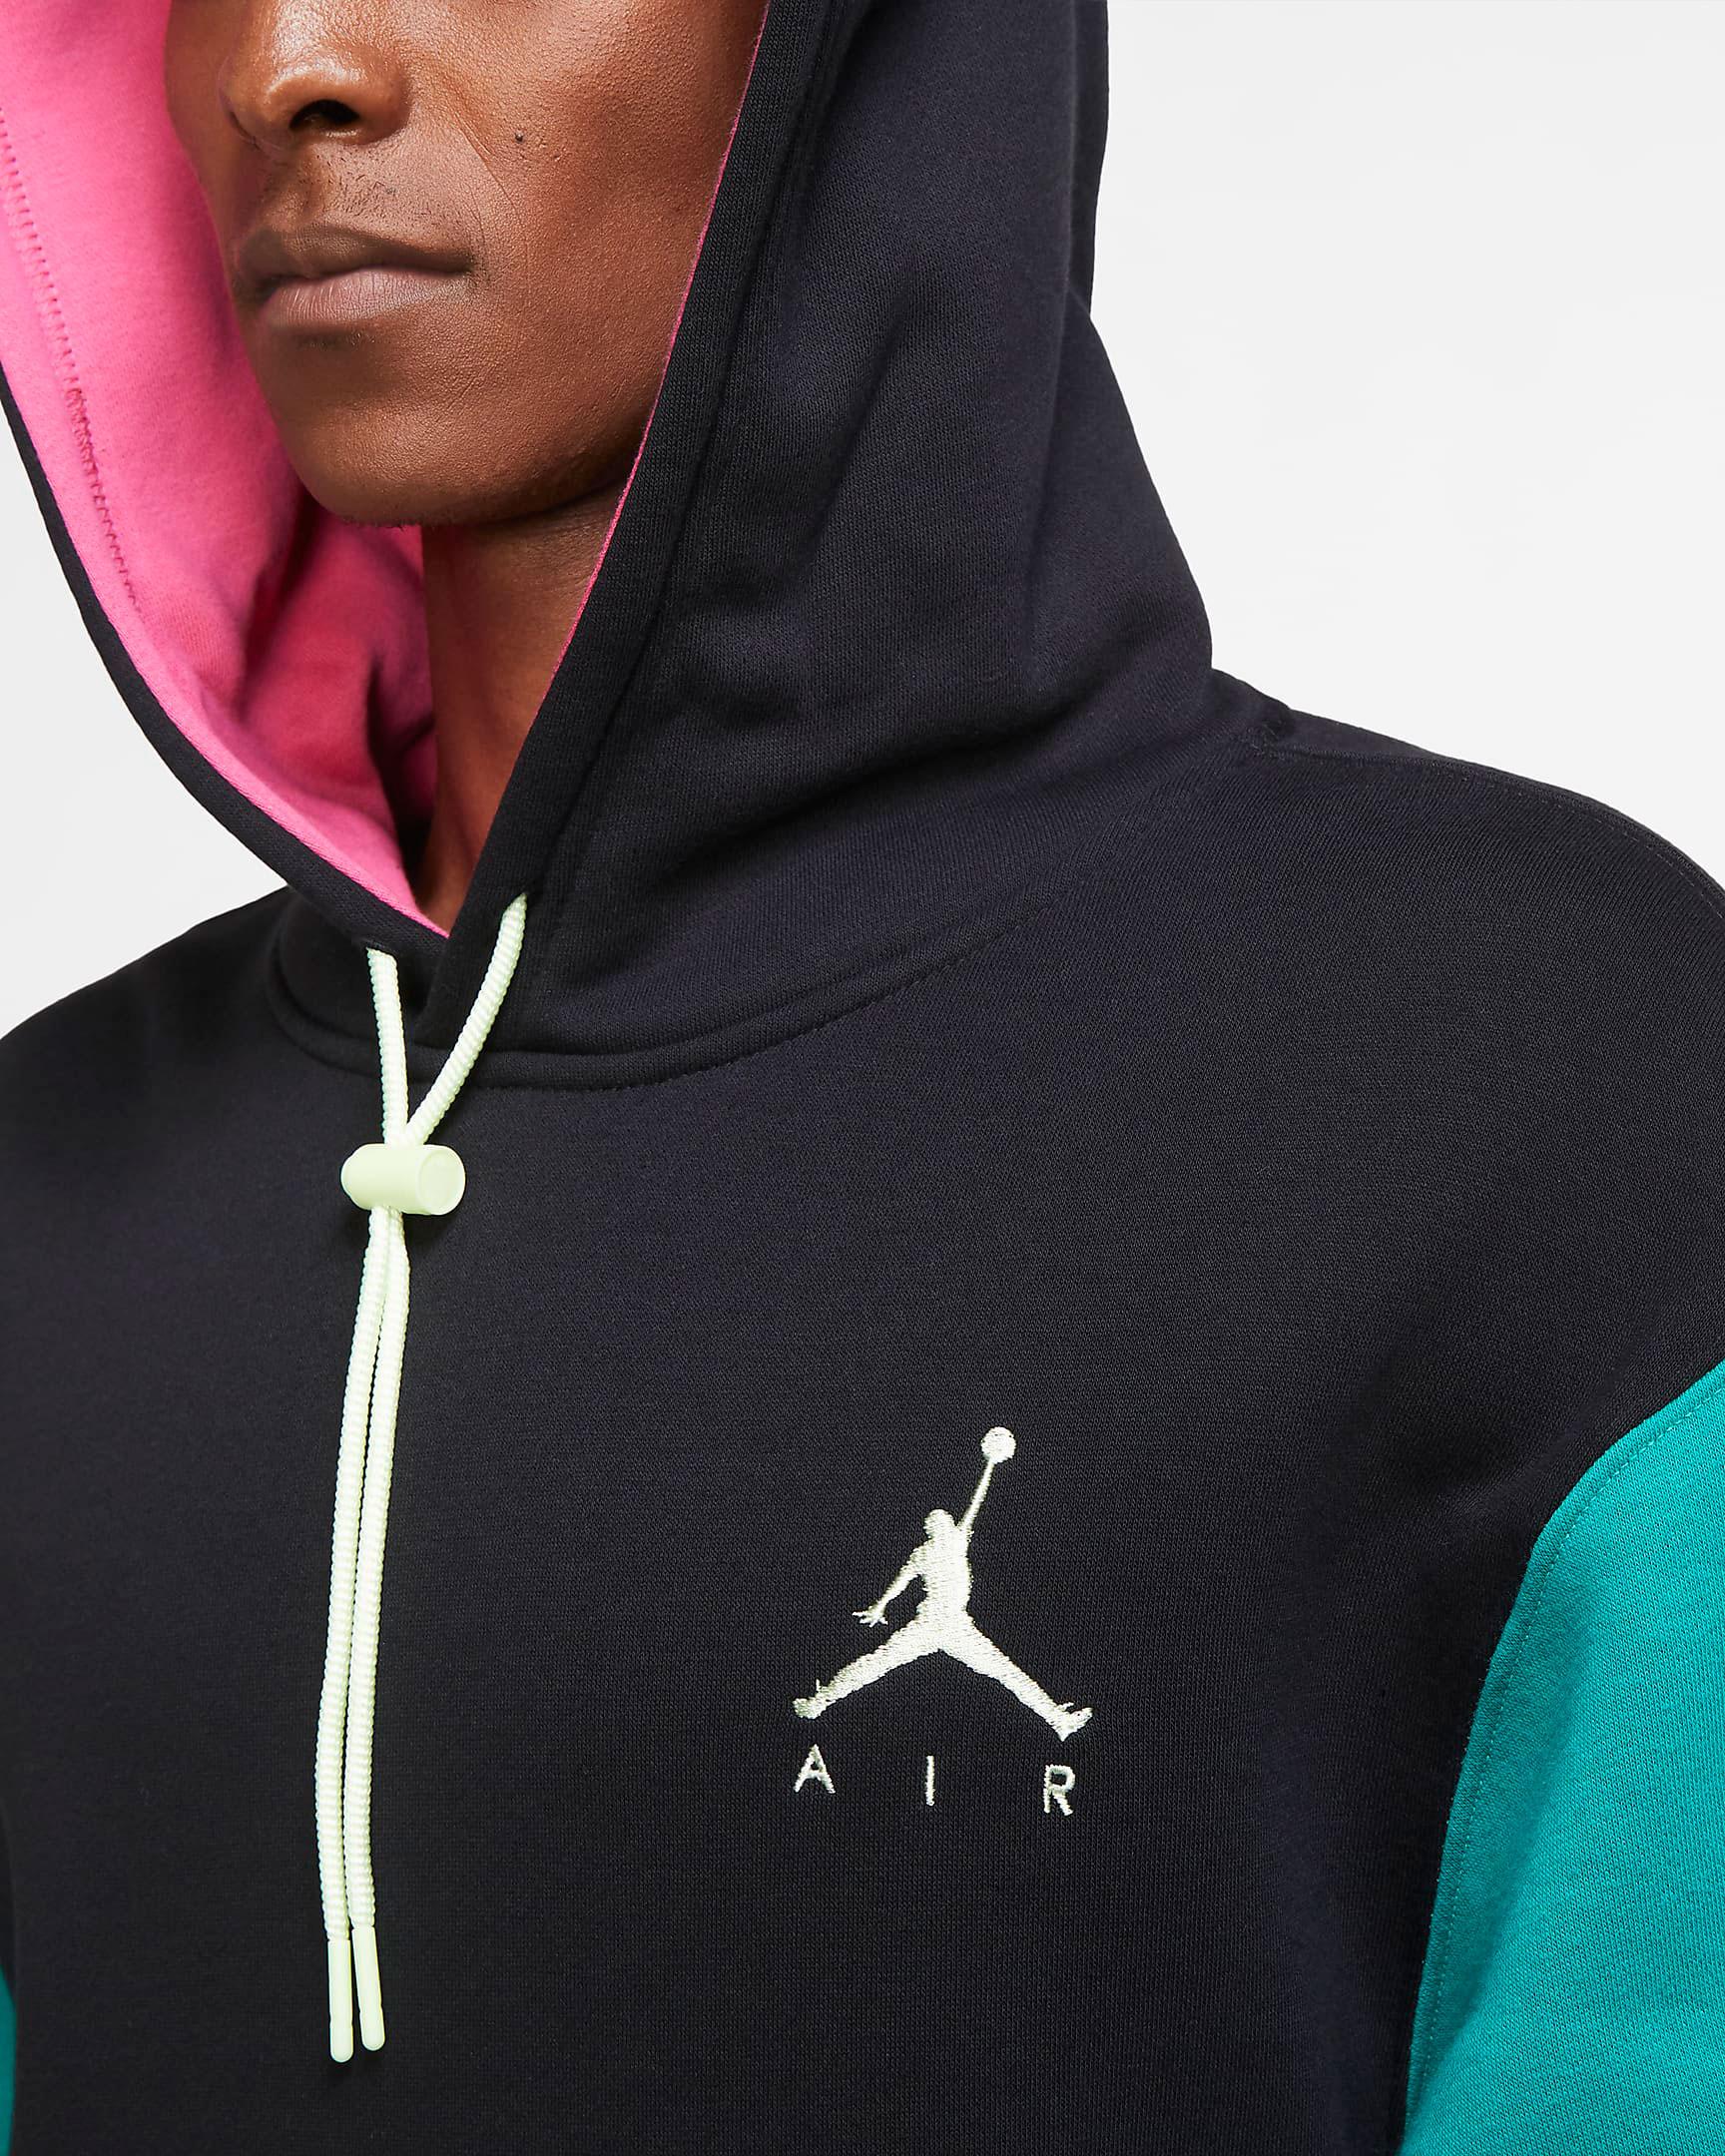 air-jordan-5-bel-air-hoodie-match-1